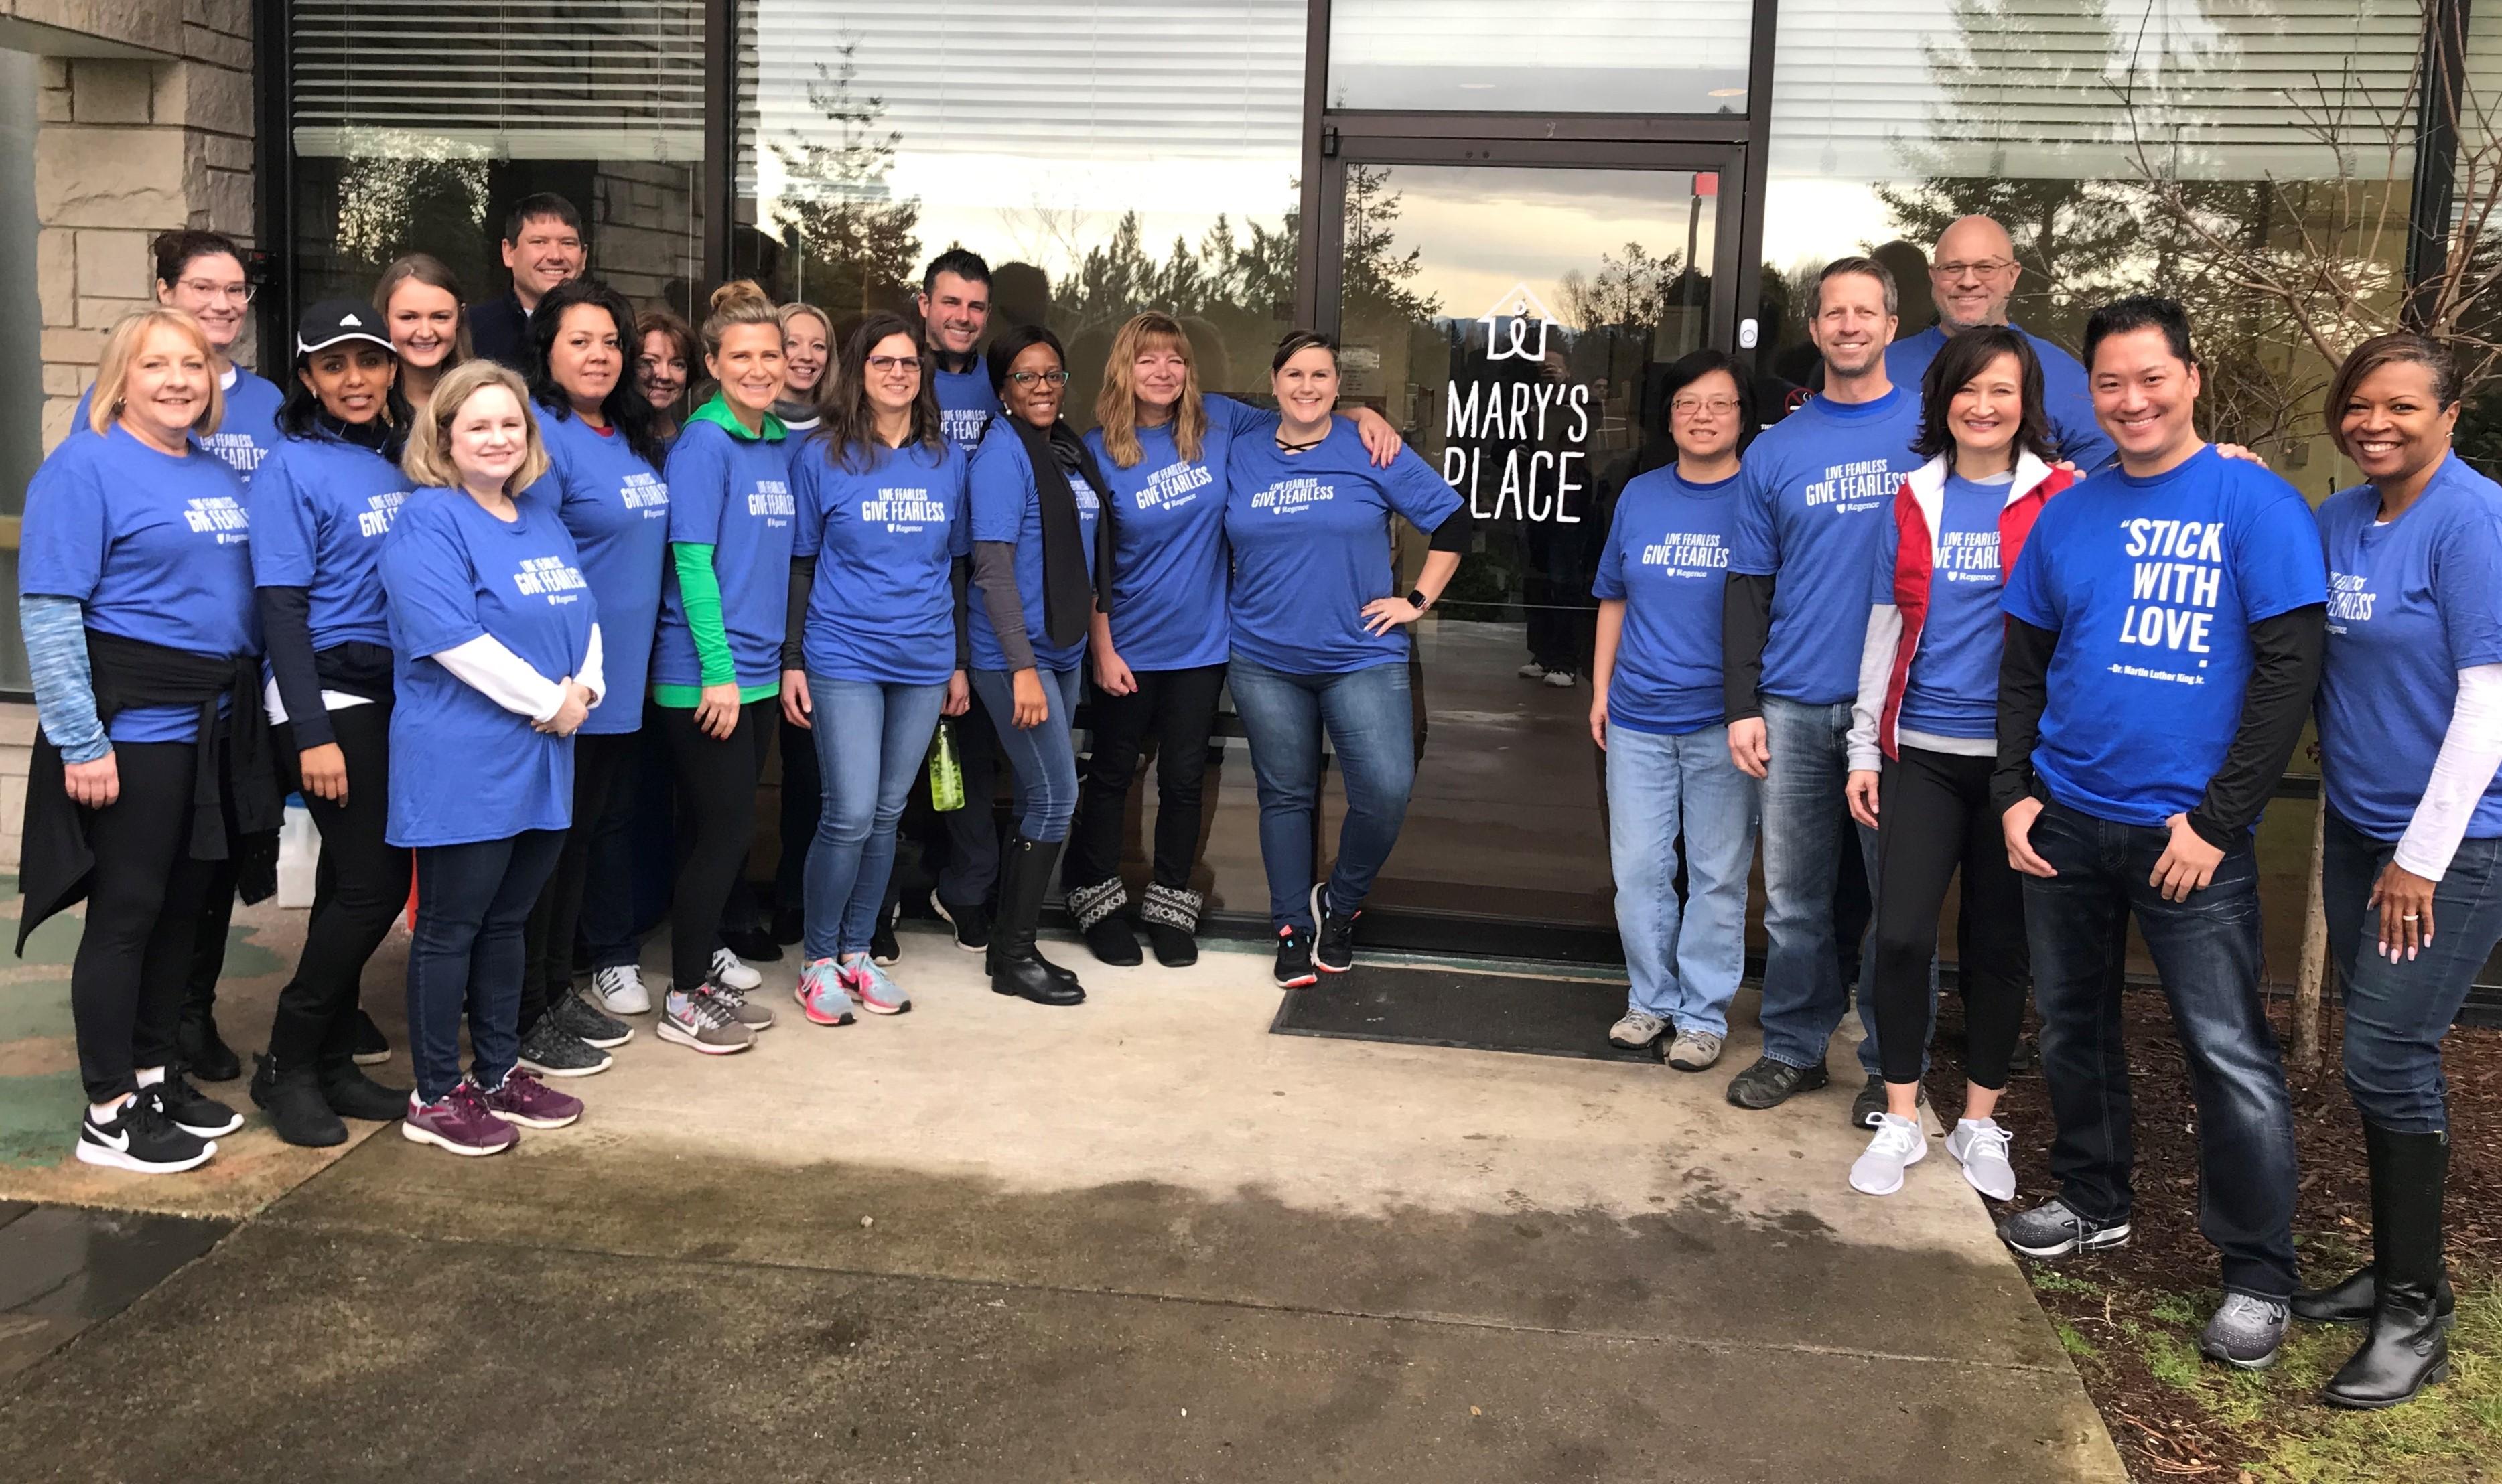 Marys Place Regence employee volunteers